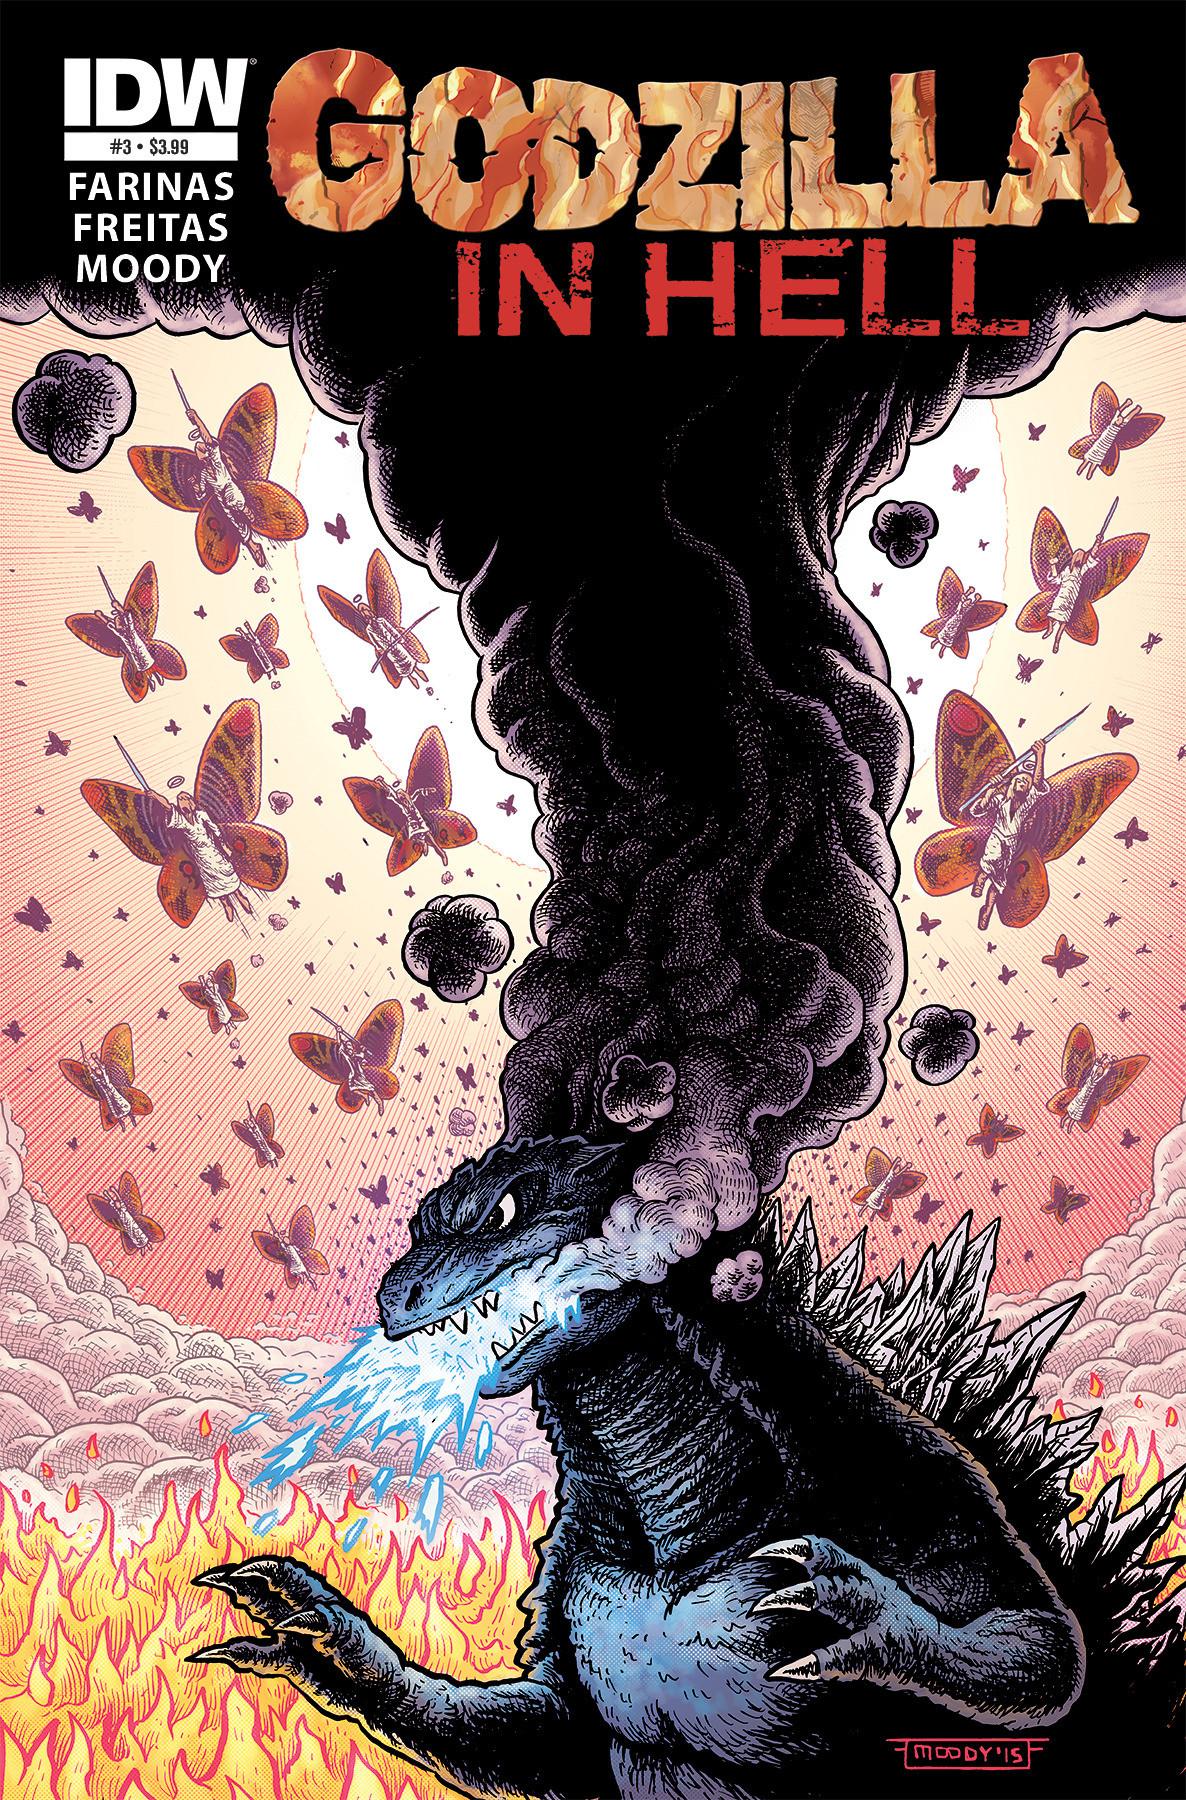 Godzilla in Hell #3 cover art, alternative cover dressing.